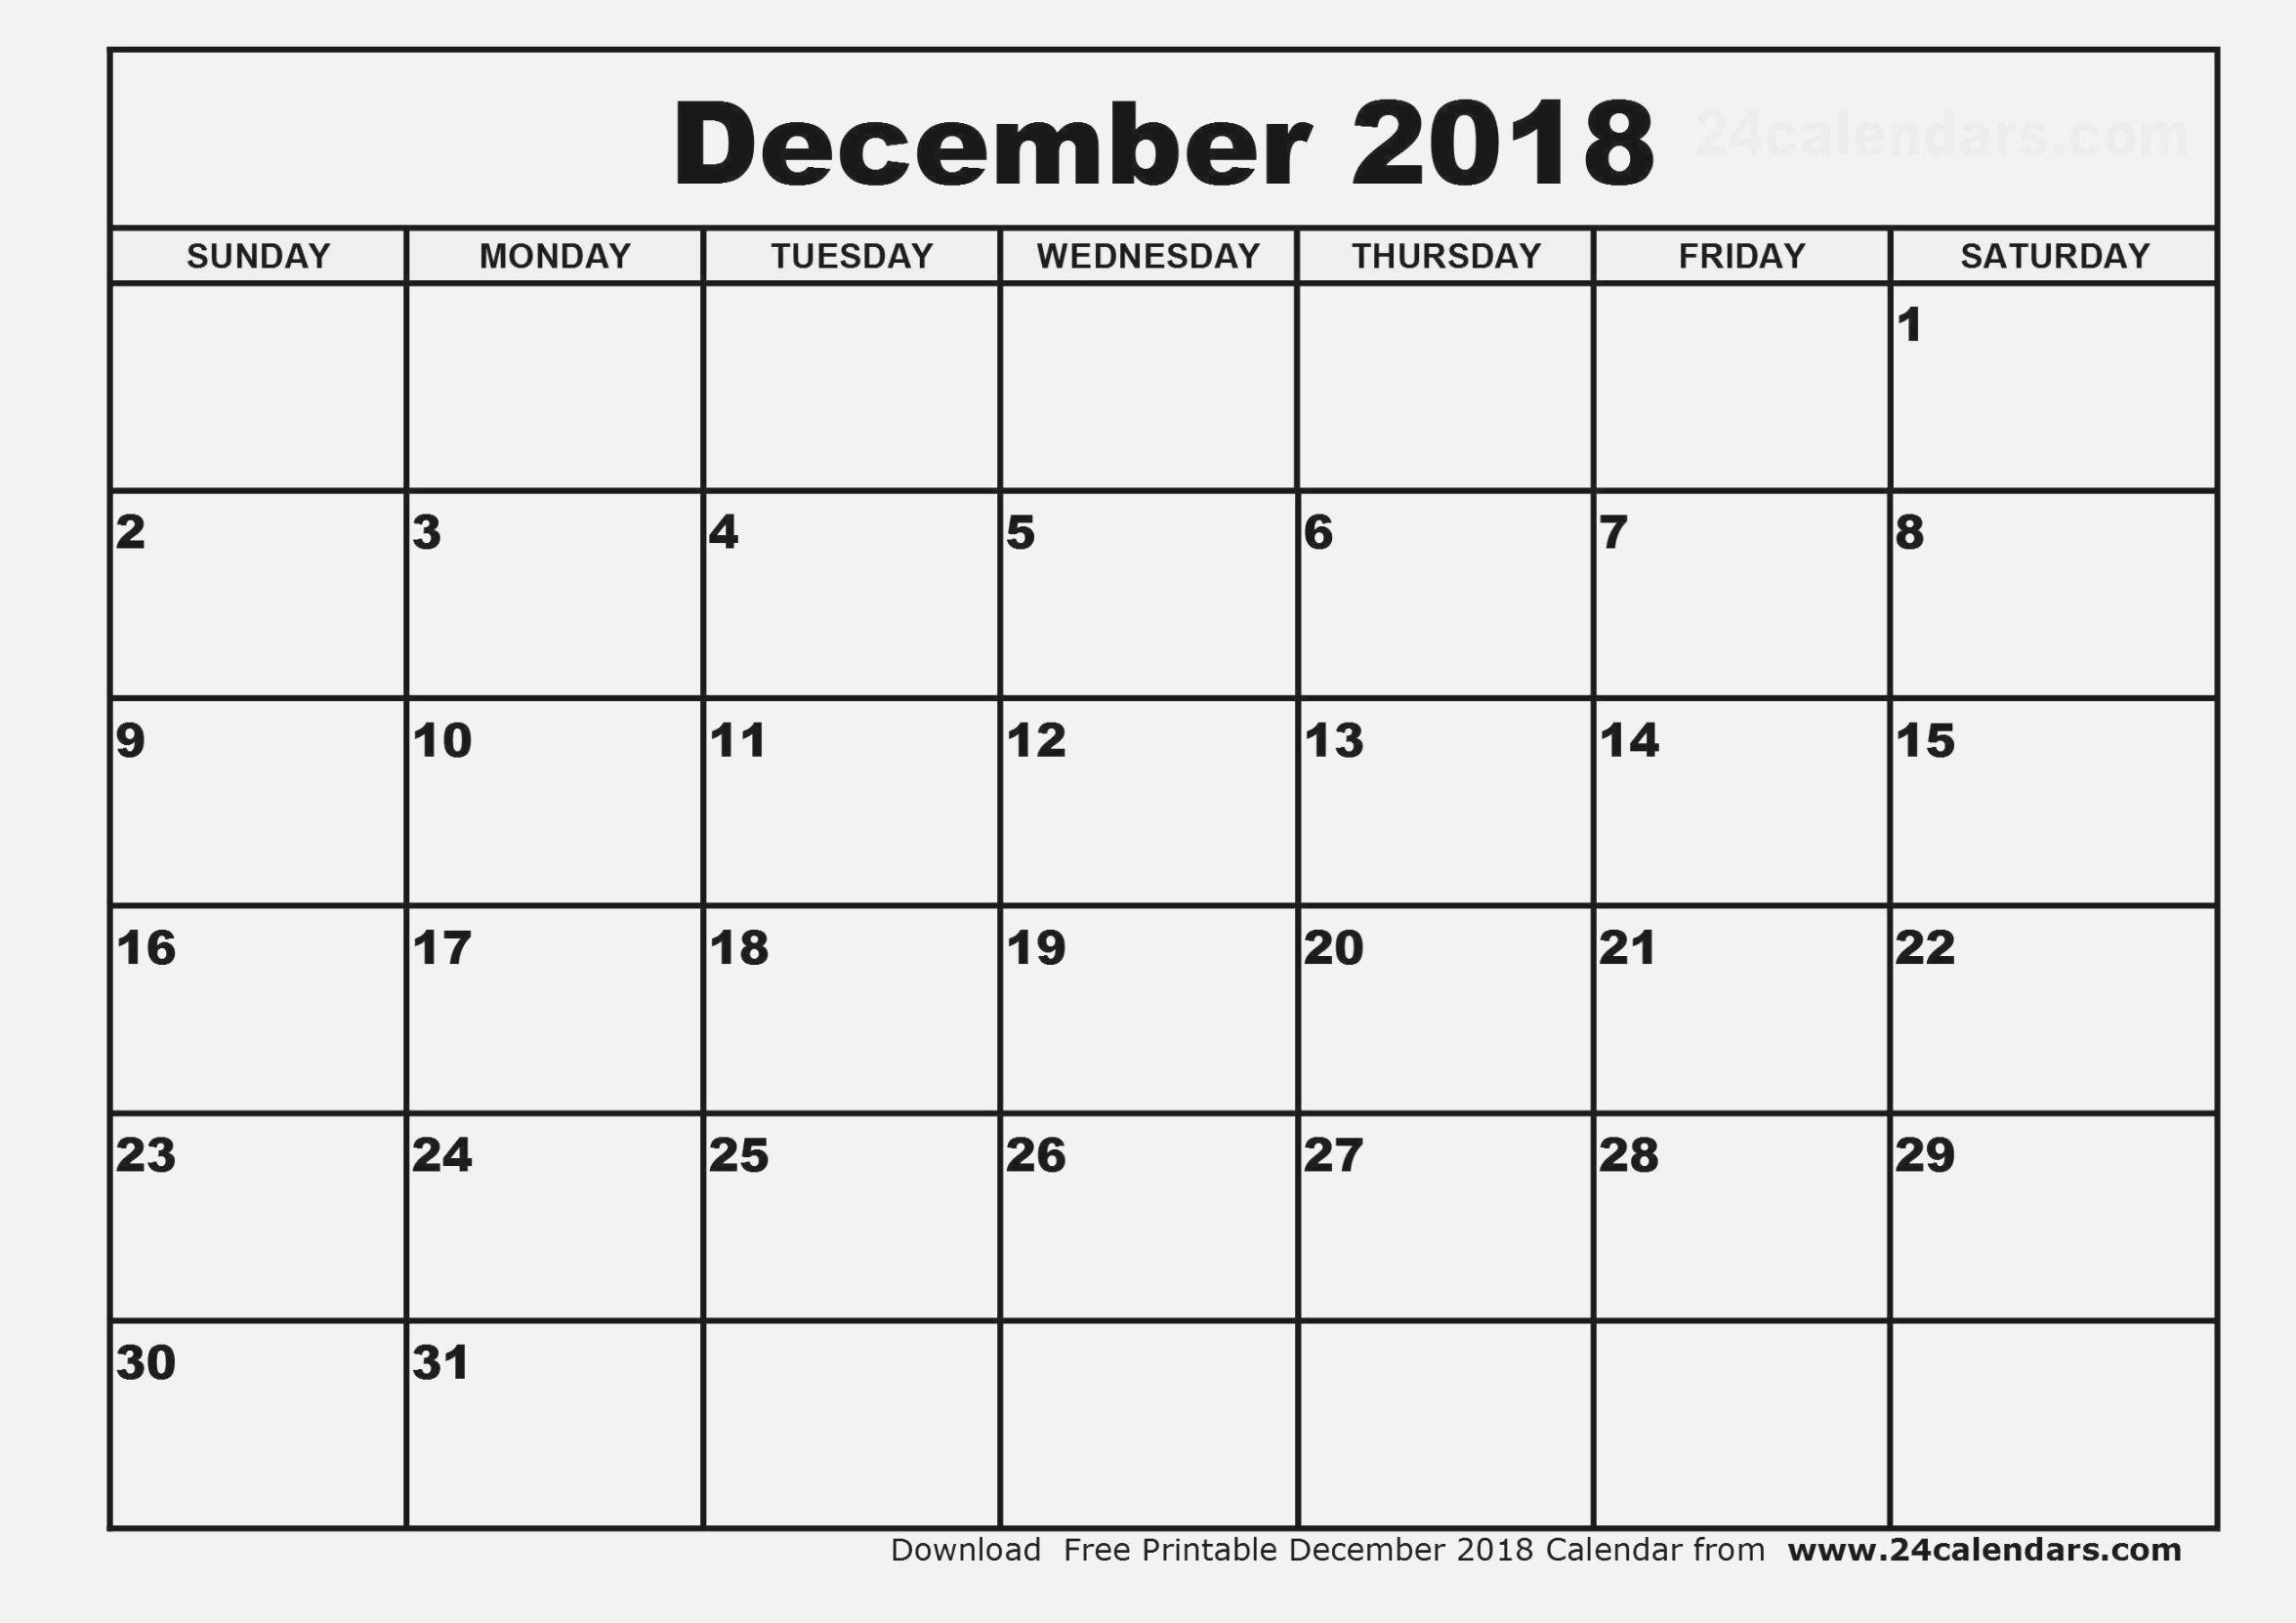 47 Unusual Free December 47 Printable Calendar | Shibata - Free Printable Winterization Stickers